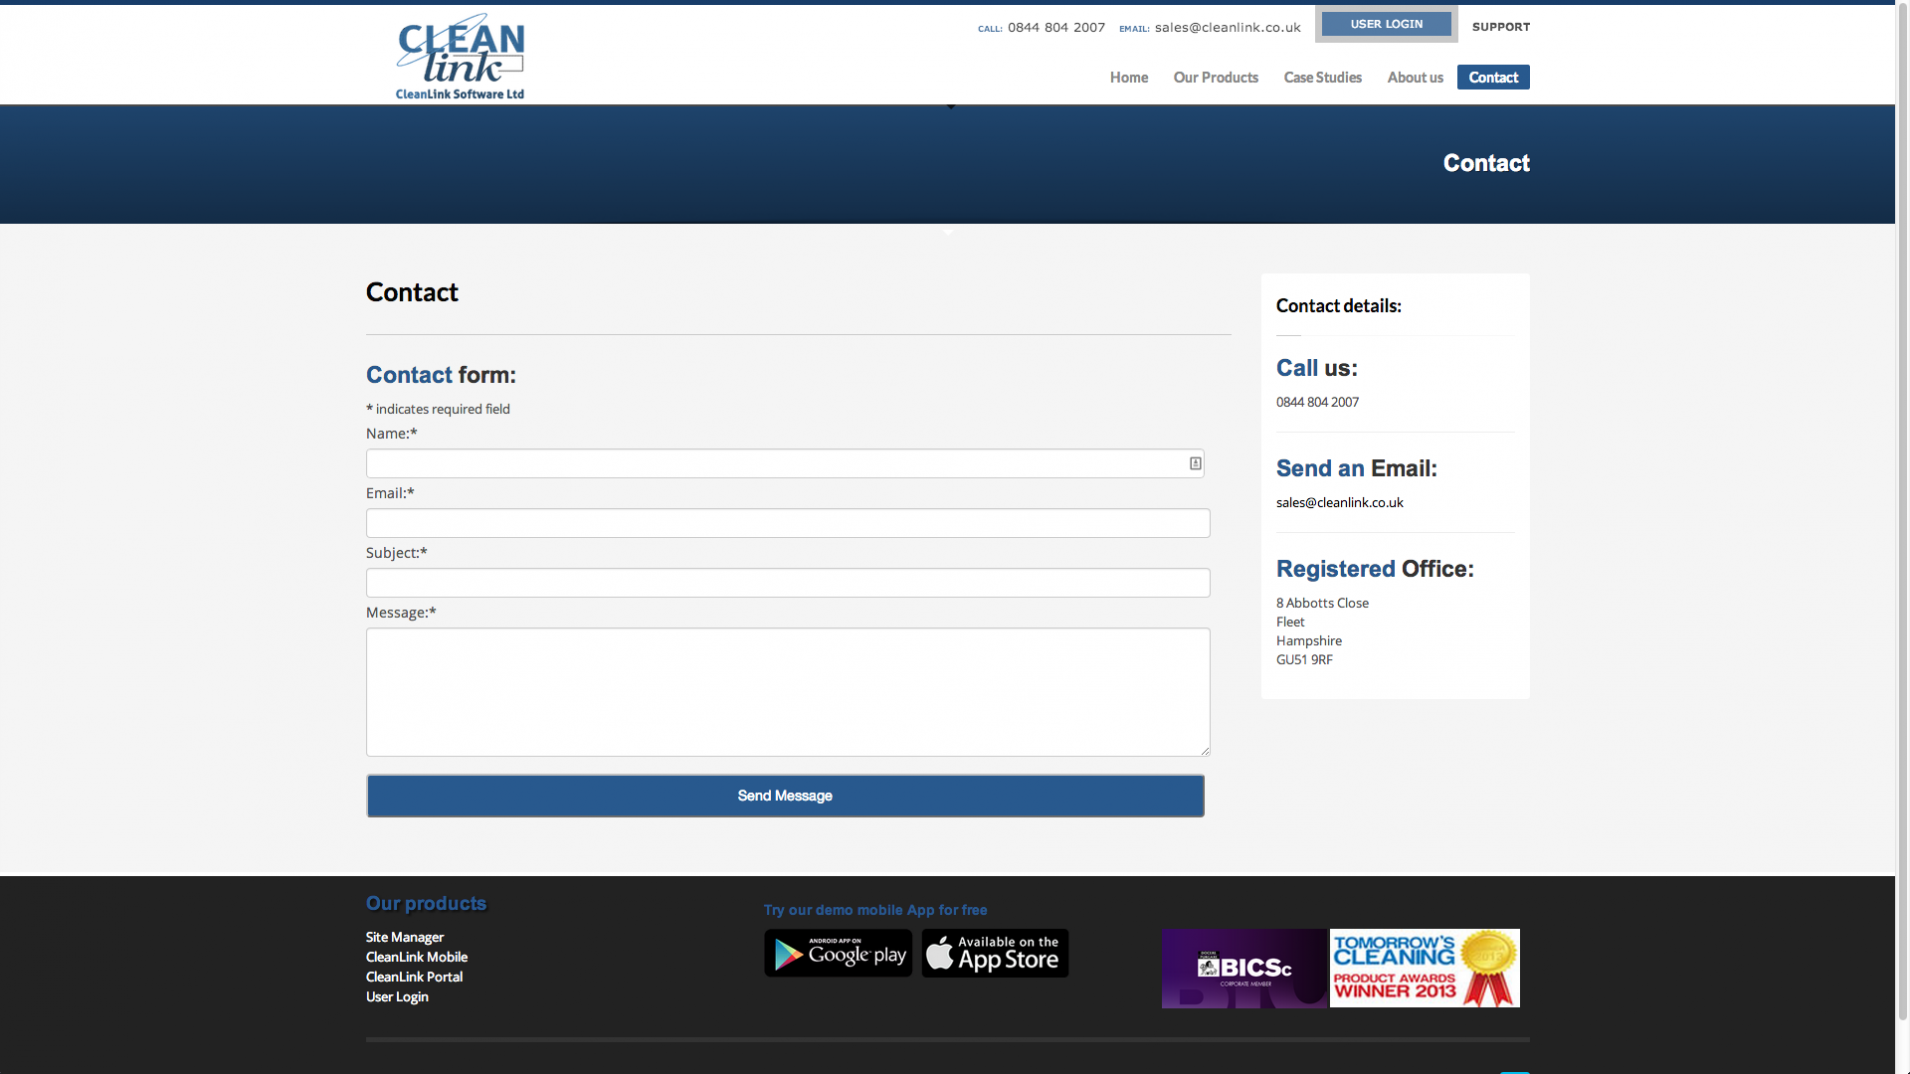 Screen Shot 2013 12 23 at 16.27.37 - Webdesign for software development company